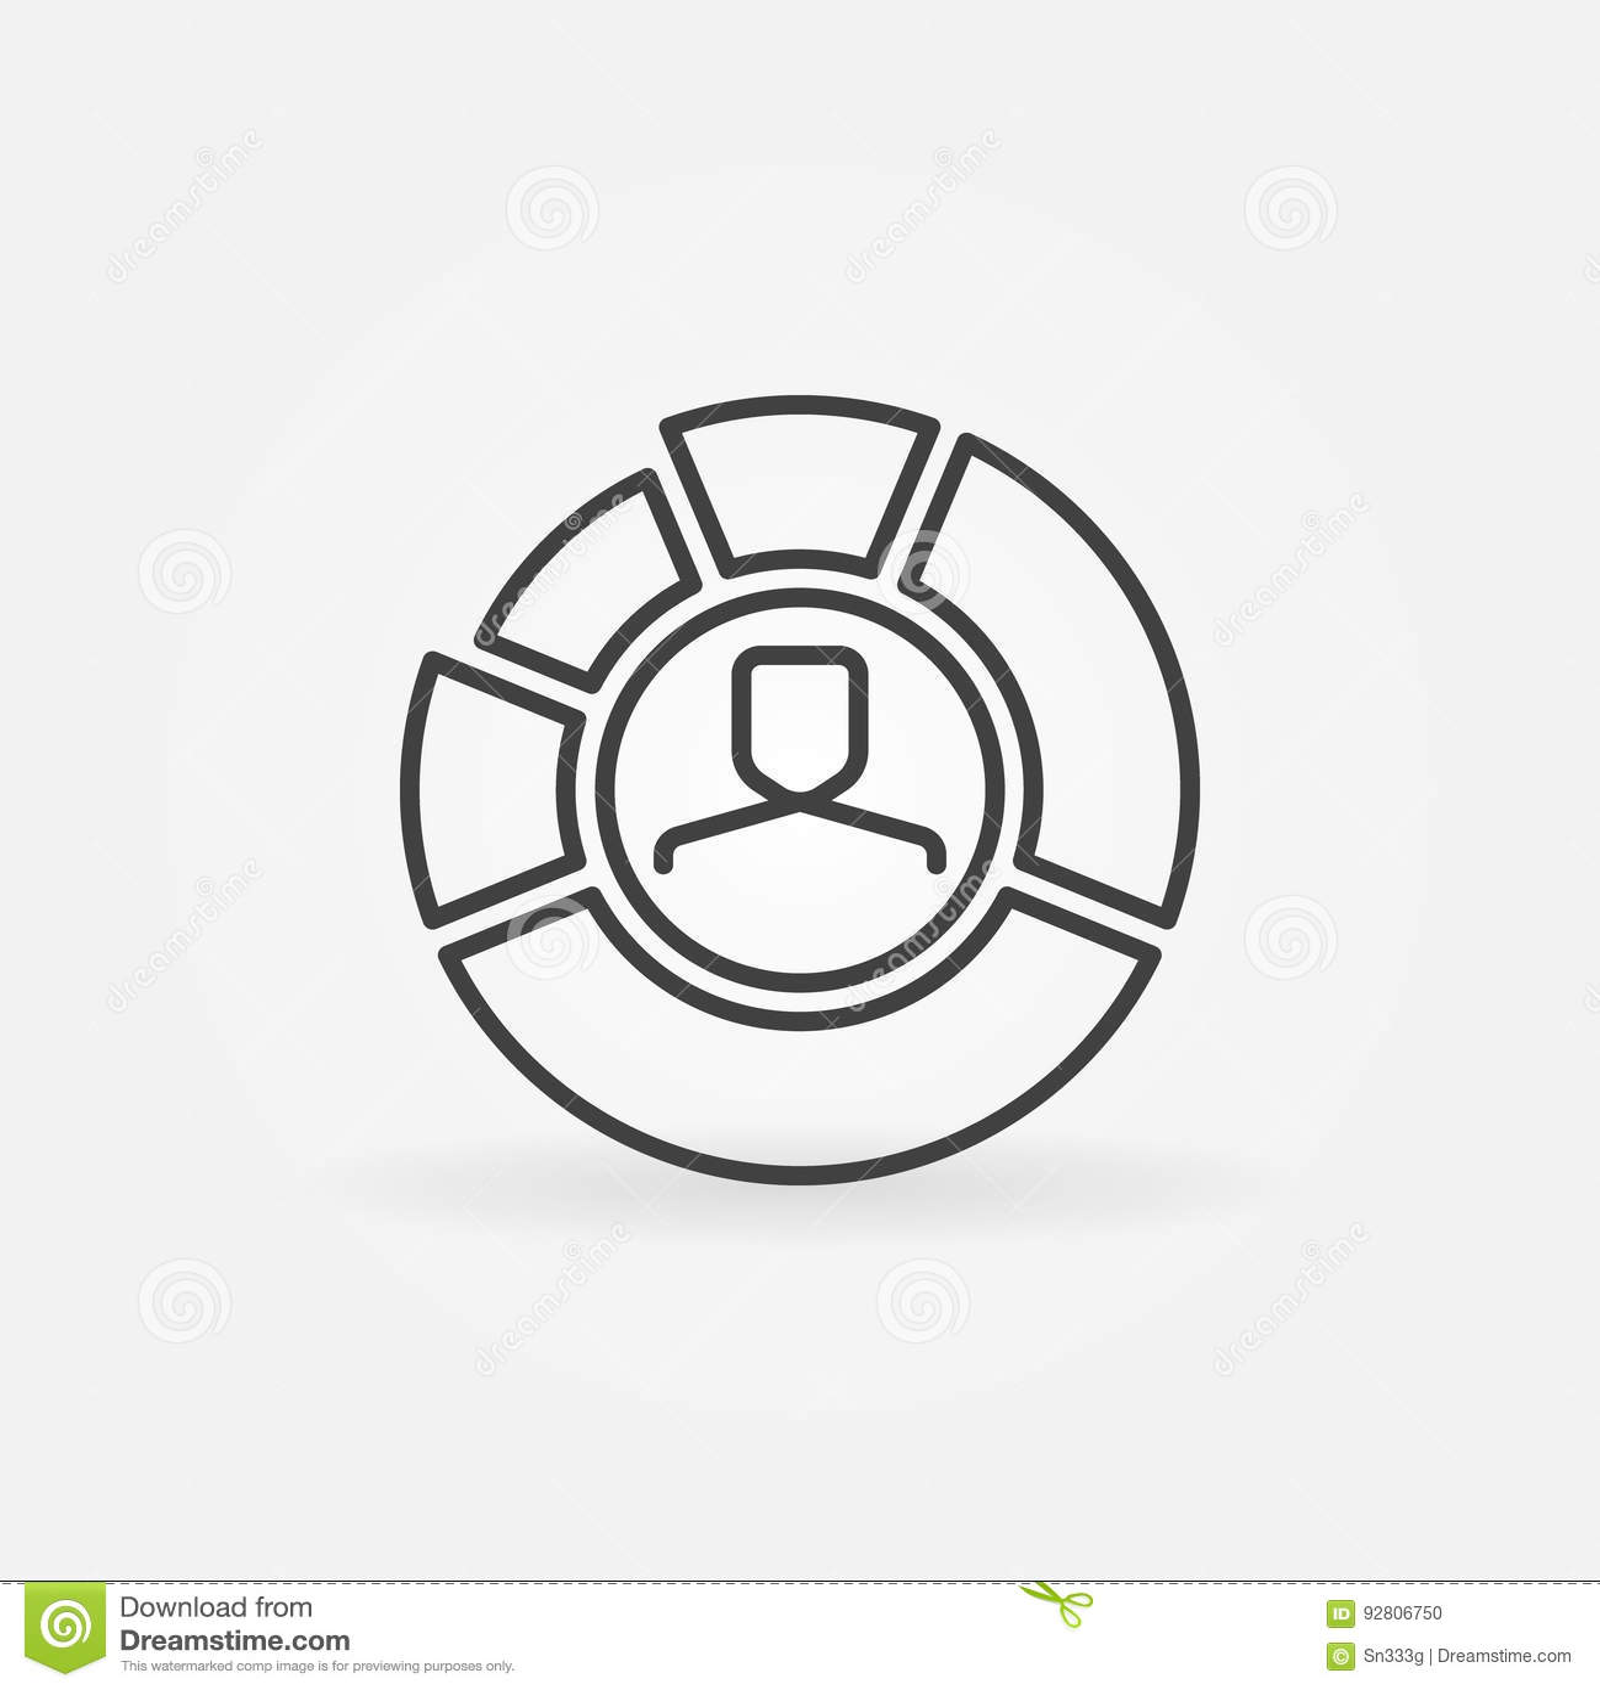 pie chart with face inside outline icon stock vector illustration rh dreamstime com Face Muscles Diagram Contour Face Diagram